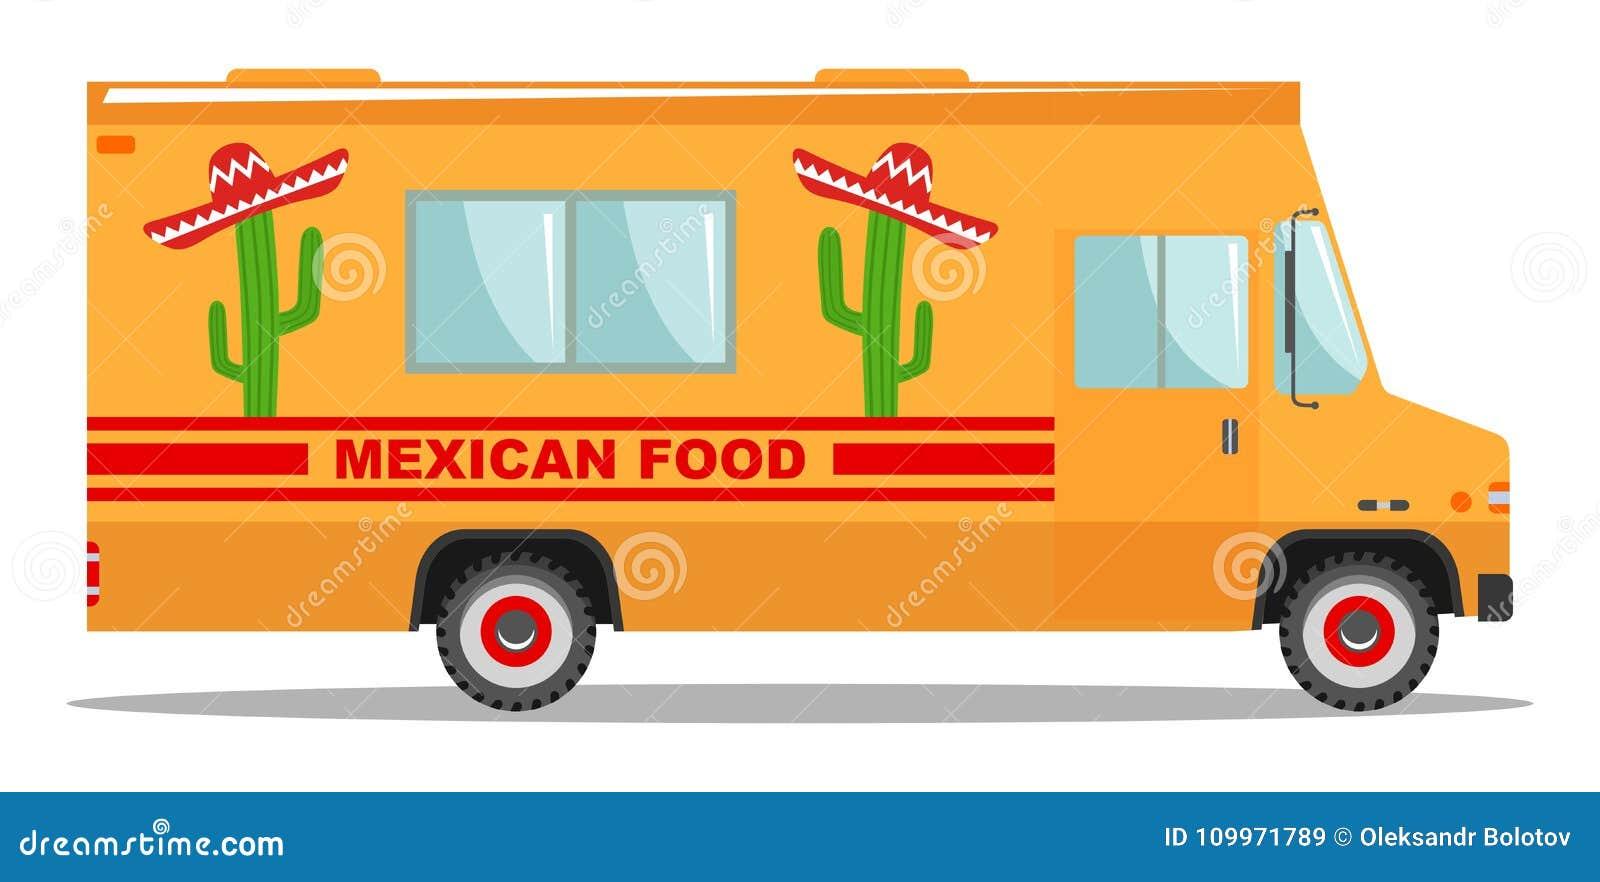 Flat Design Vector Cartoon Colorful Illustration Of Food